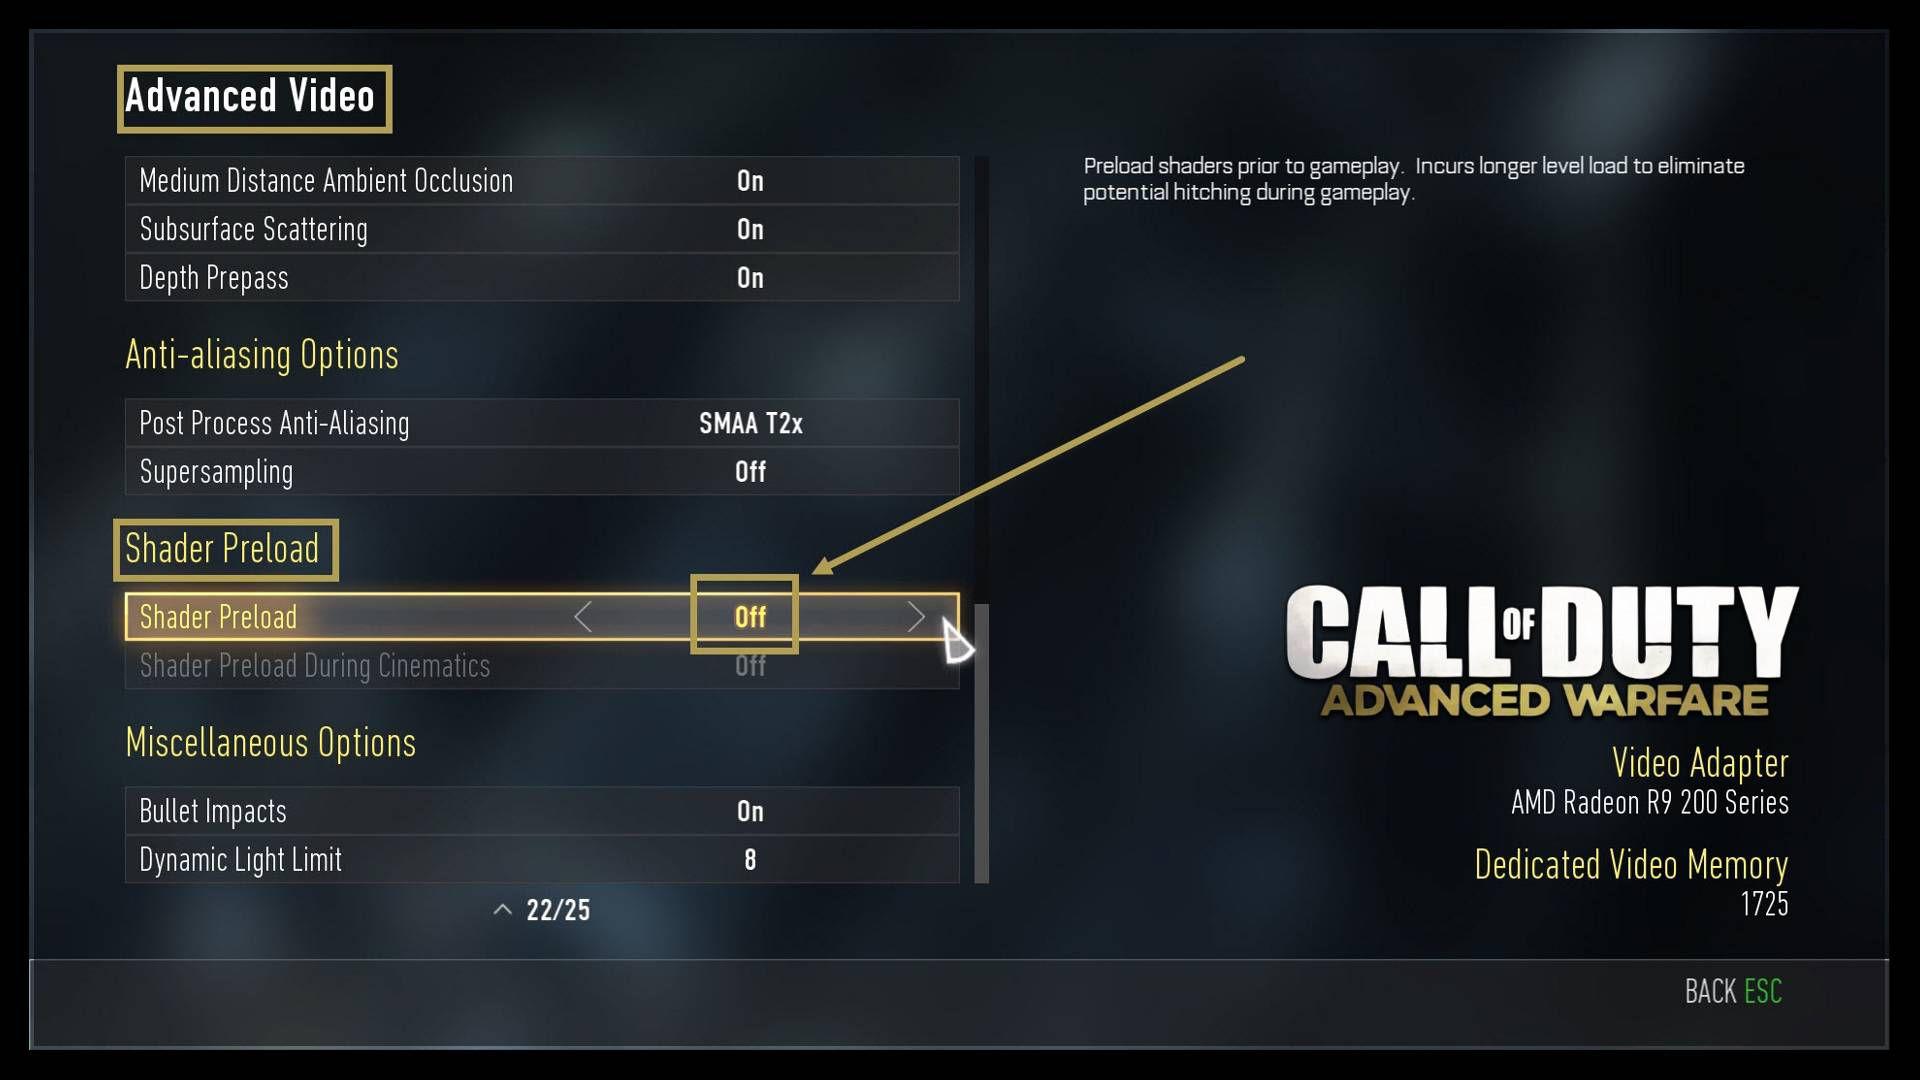 Call of Duty Advanced Warfare Direct3DDevice: Present Failed: (error 0x887a0005) Hatası